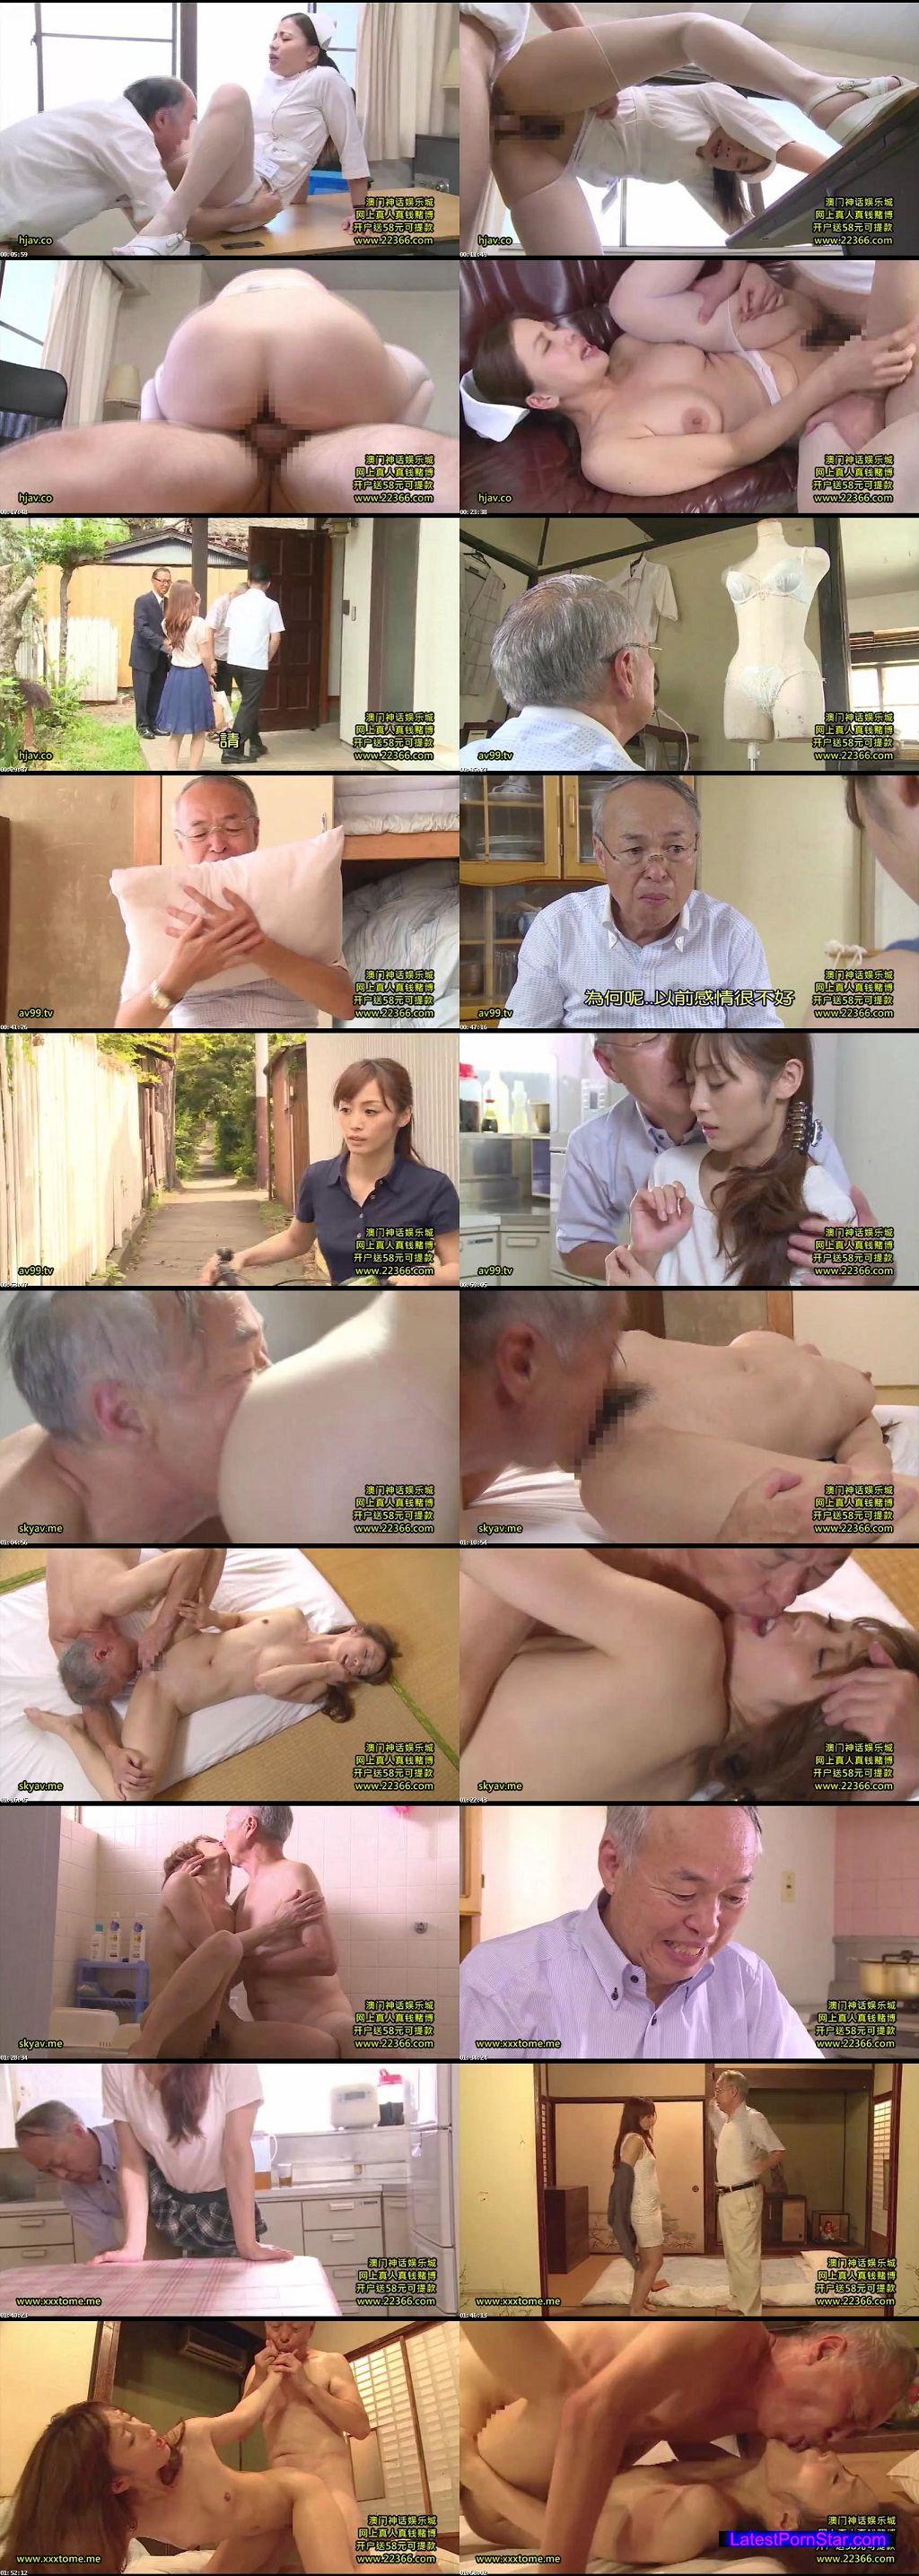 [BNSPS-391] 老人とのいやらしすぎるセックス 物凄い舐めに喚起する女たち